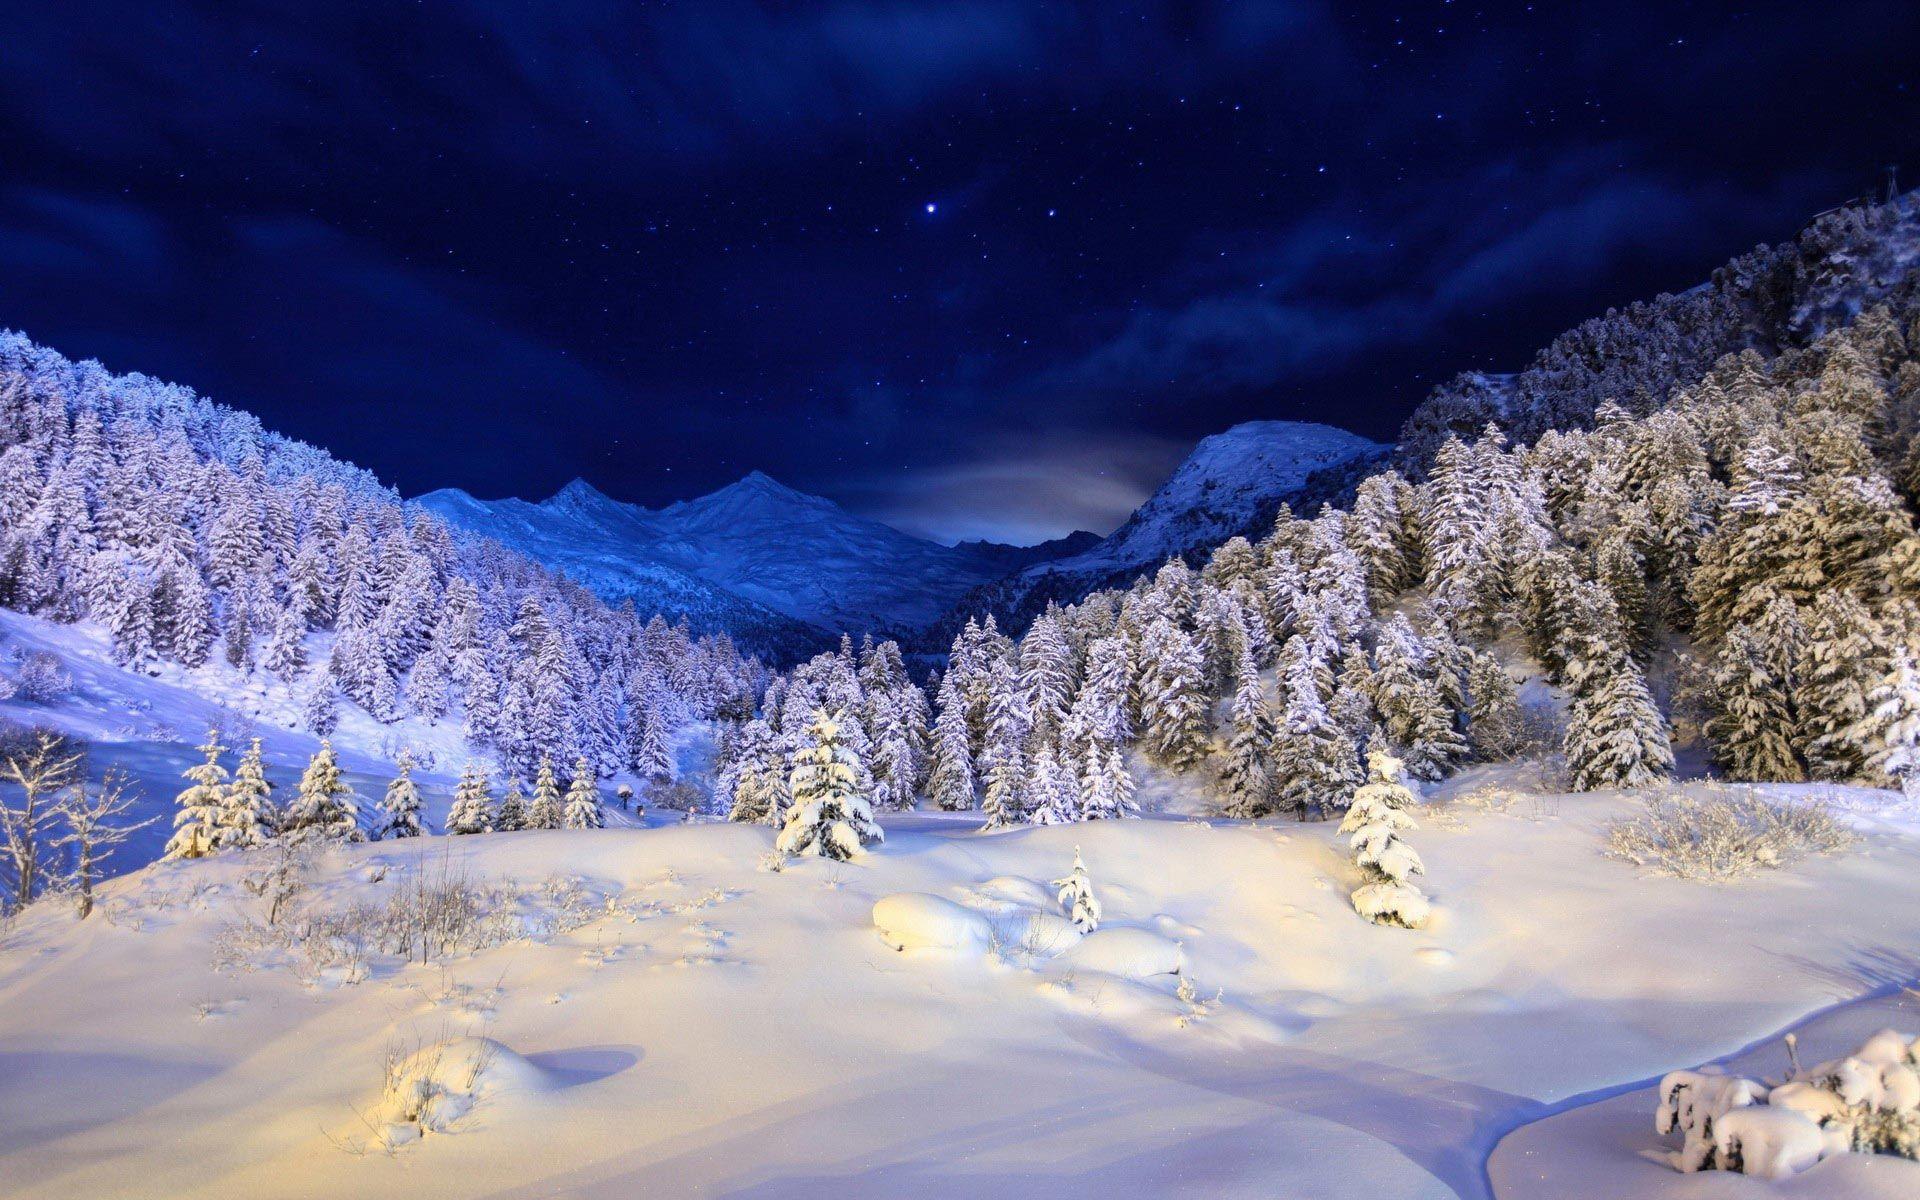 Winter Night Snow Landscape Hd Image Amazing Hd Wallpapers Winter Landscape Winter Wallpaper Winter Scenery